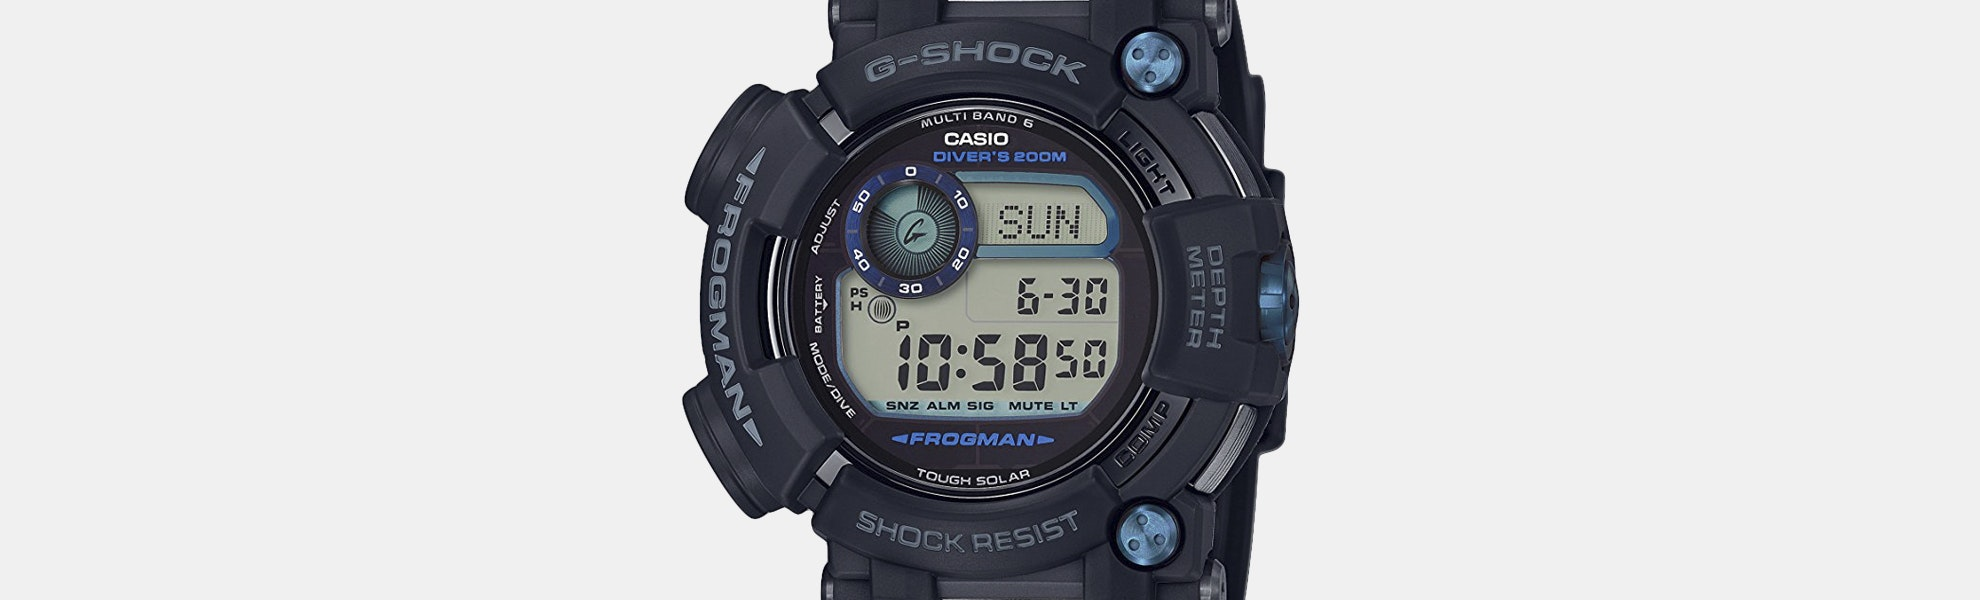 Casio G-Shock Master of G Frogman Solar Watch